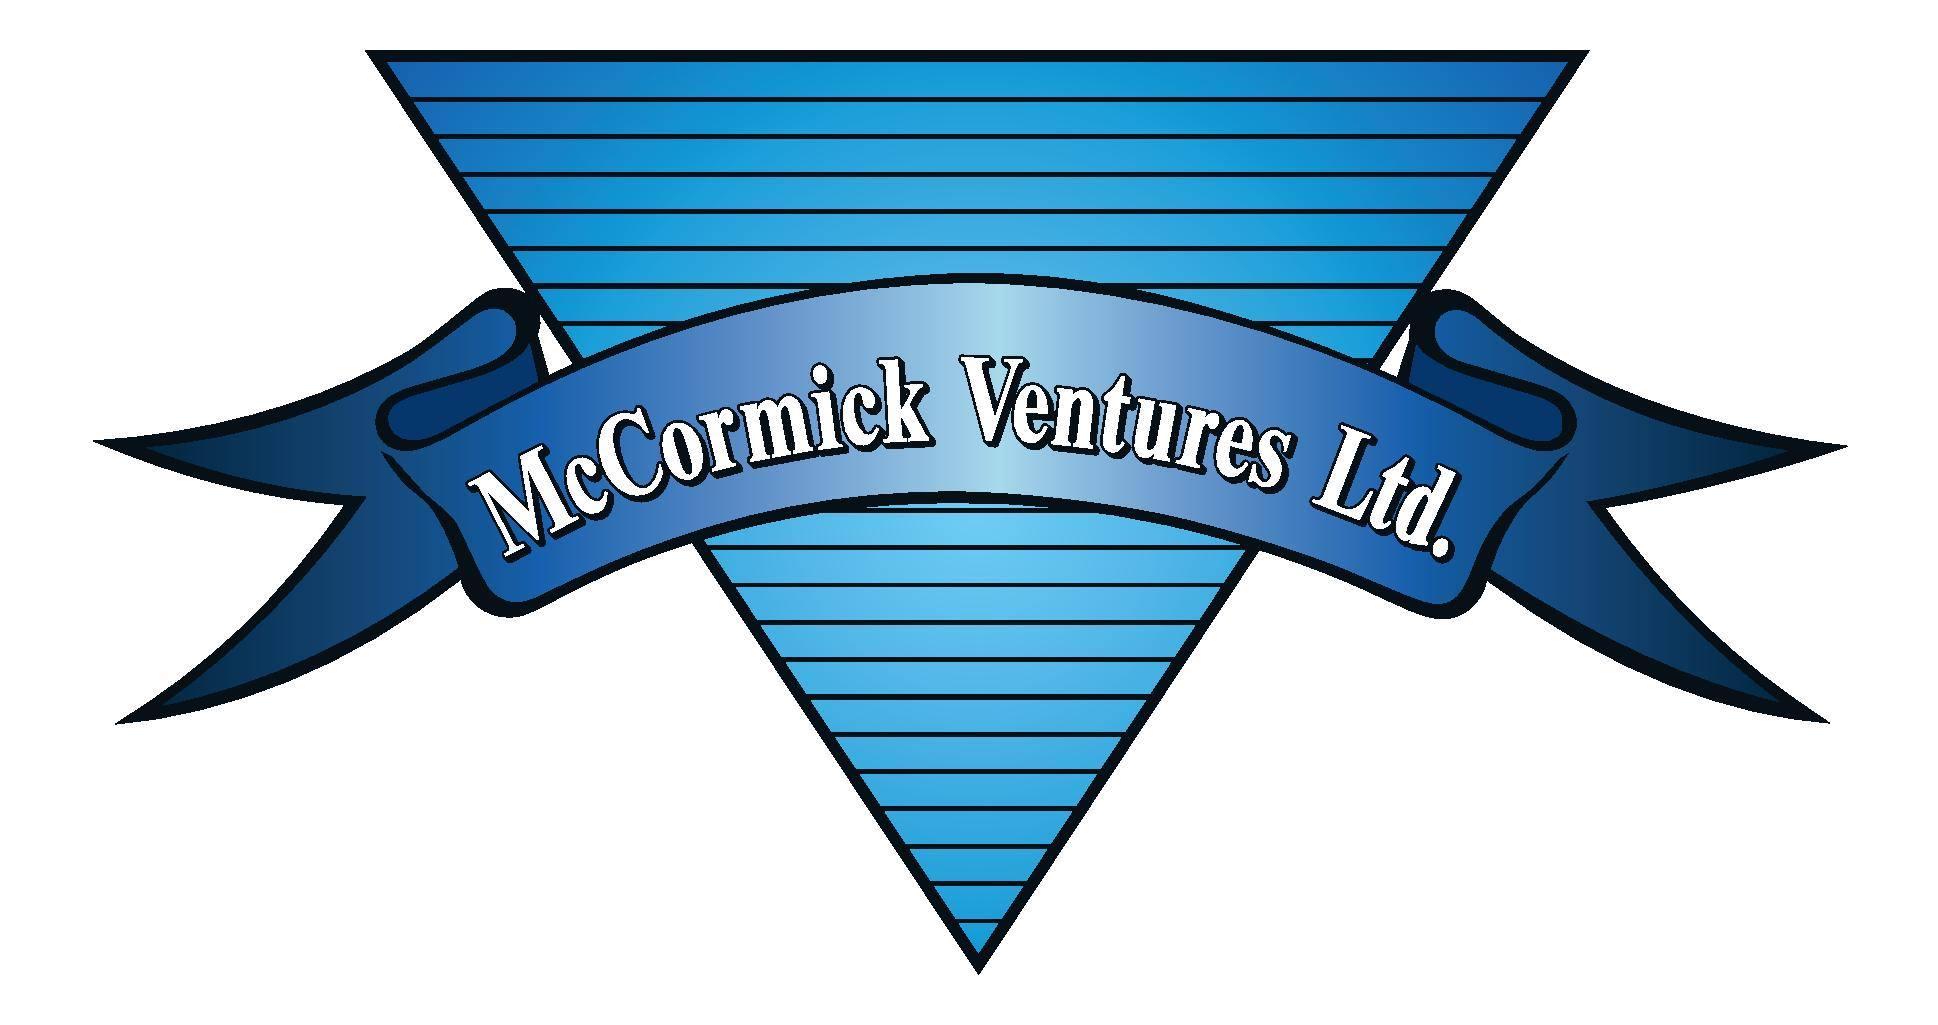 Photo uploaded by Mccormick Ventures Ltd